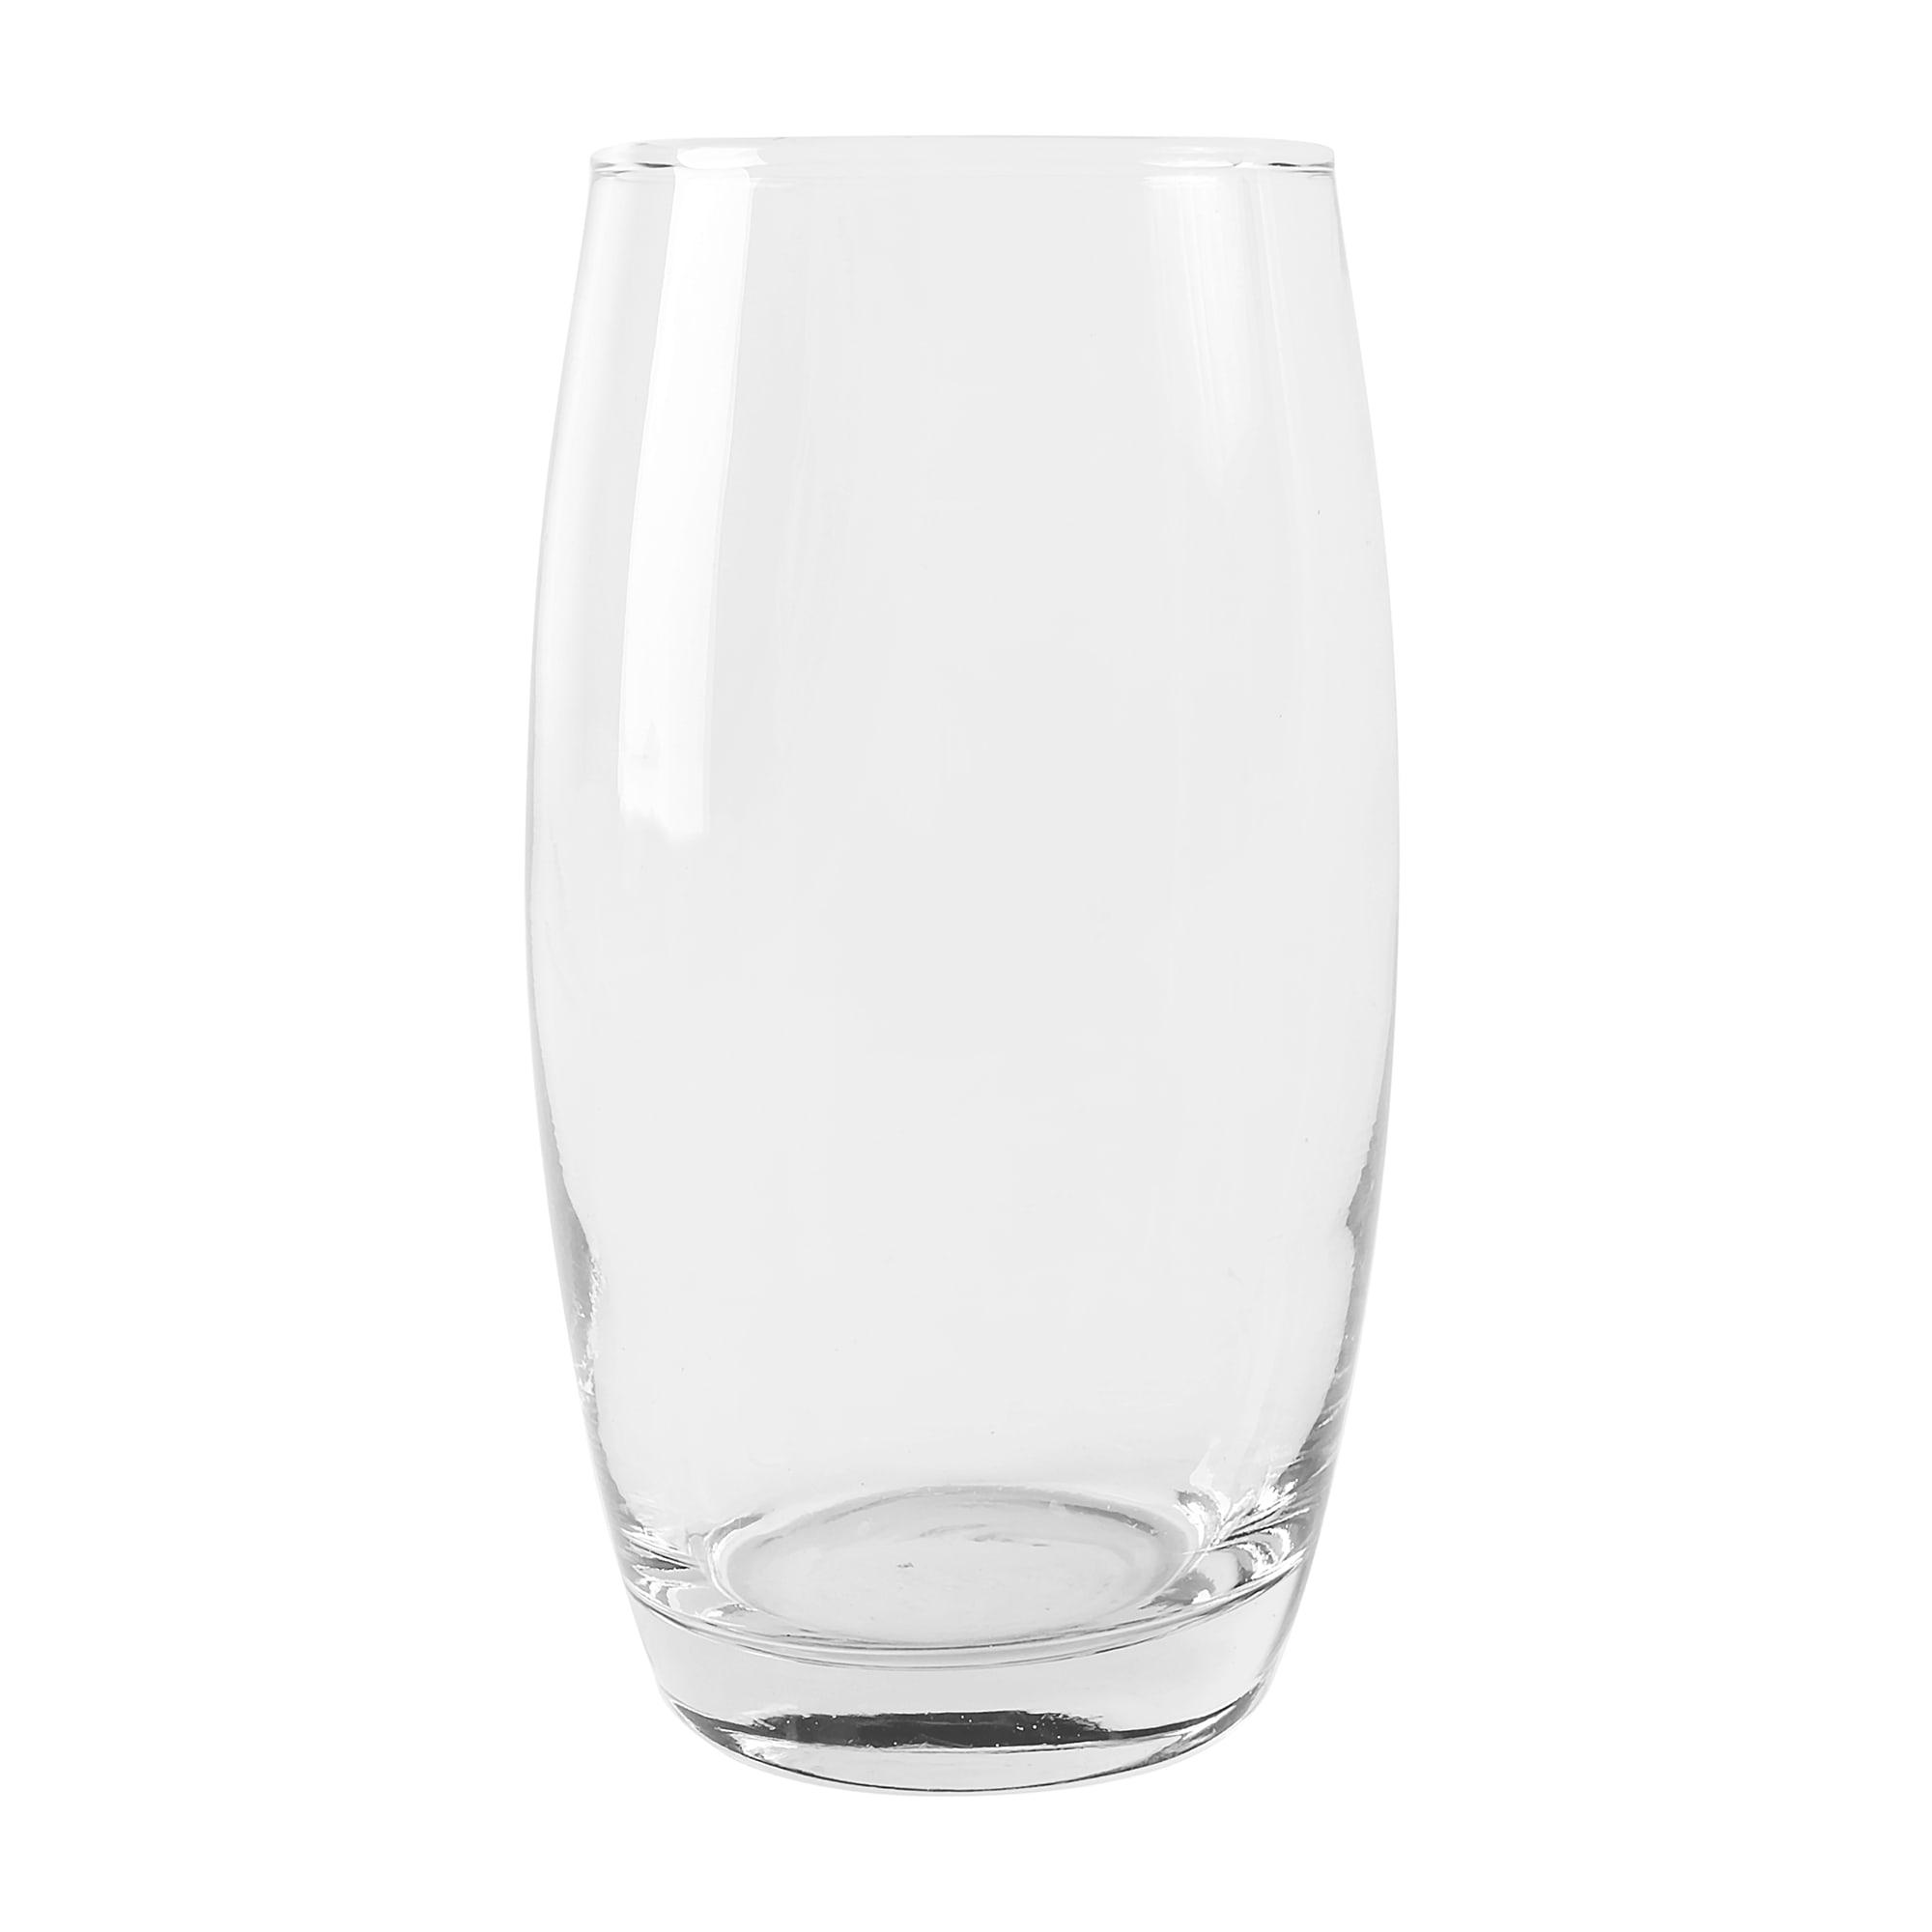 Anchor 90048 Reality 20 oz Ice Tea Glass